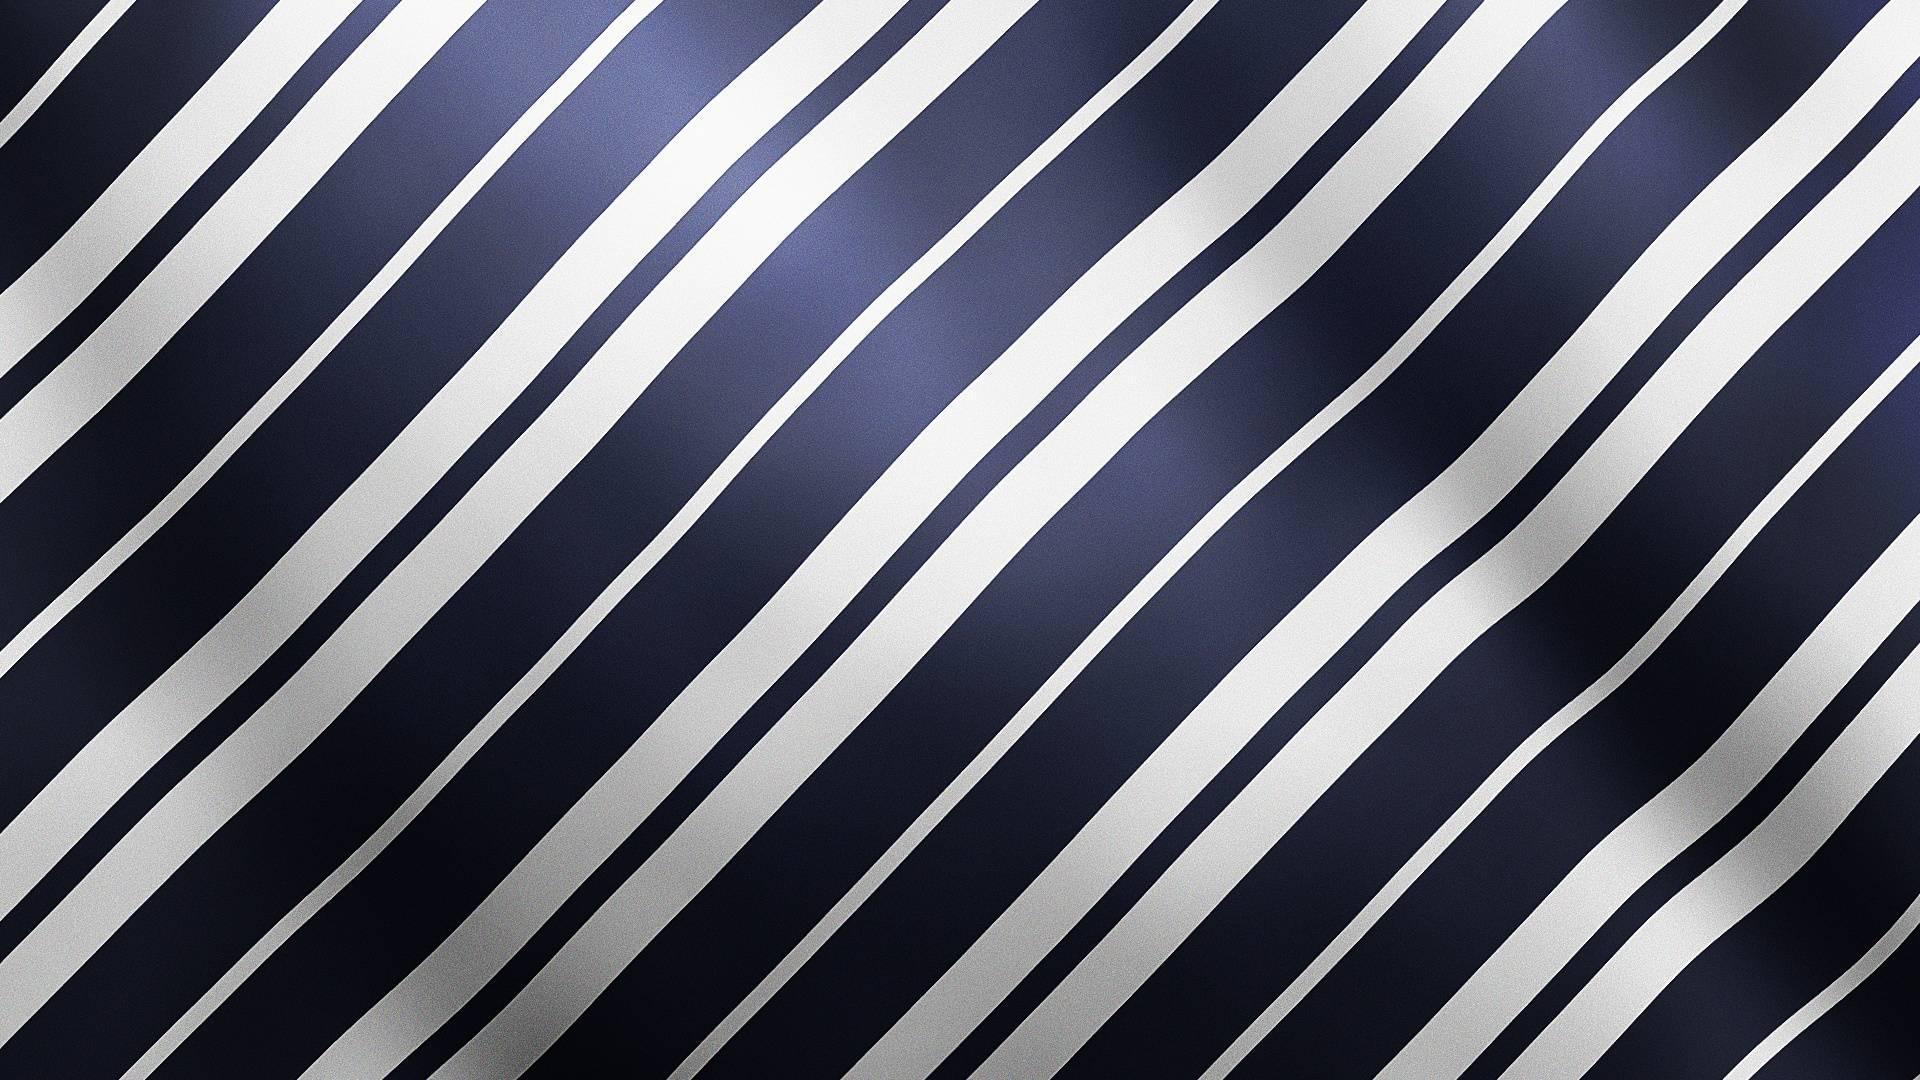 синий, текстура, белый